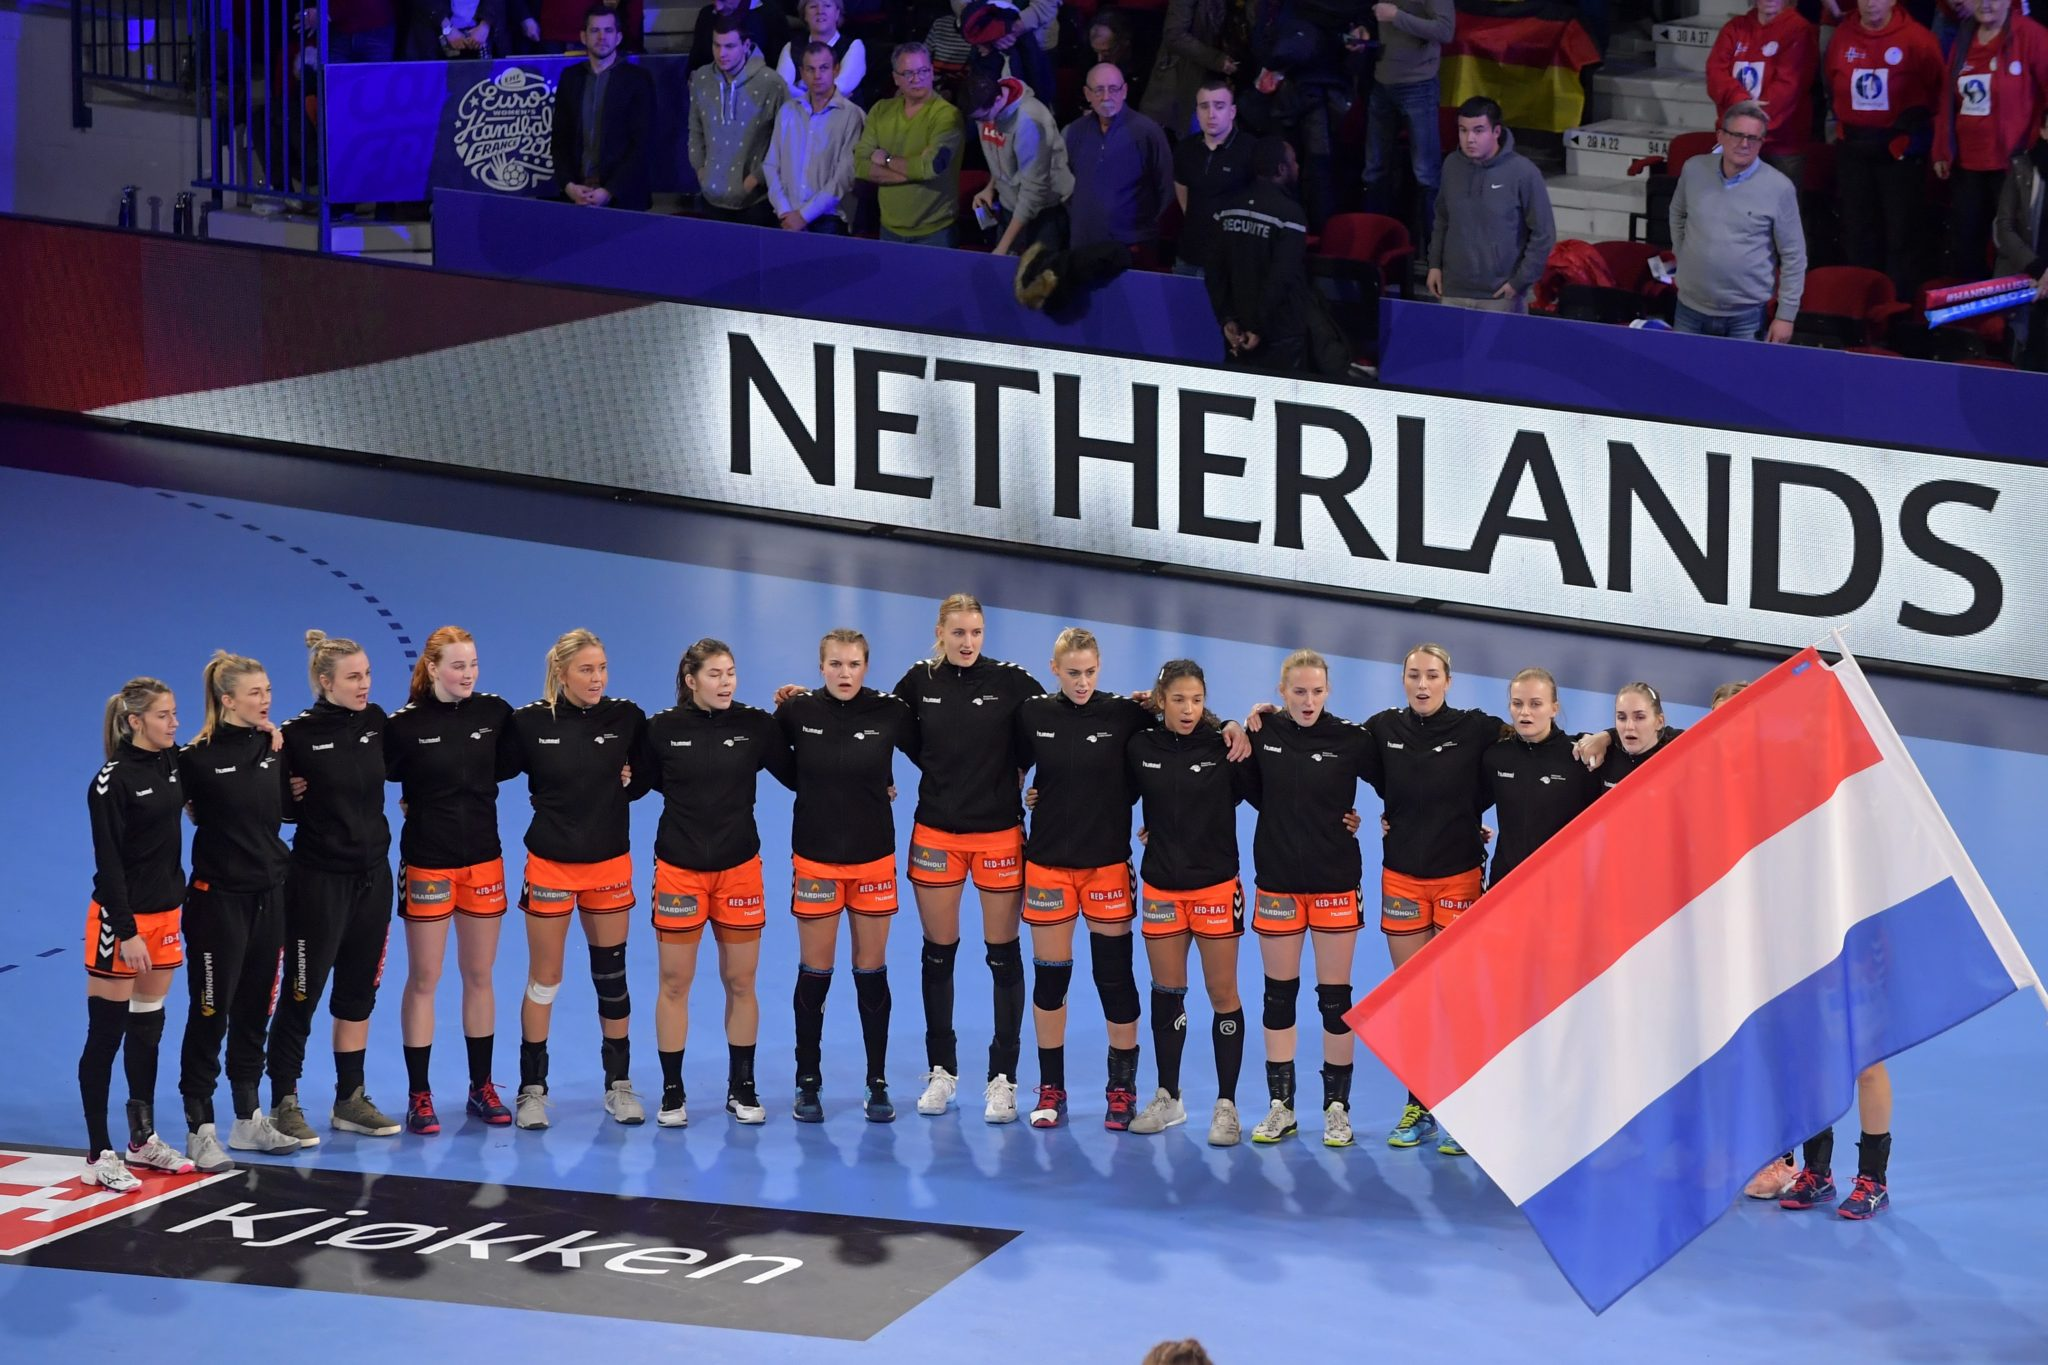 12-12-2018: Handbal: Vrouwen Nederland V Duitsland: Nancy EK Handbal In Frankrijk, Hoofdronde Groep II Nederland - Duitsland Nederlandsteam Bij Het Volkslied